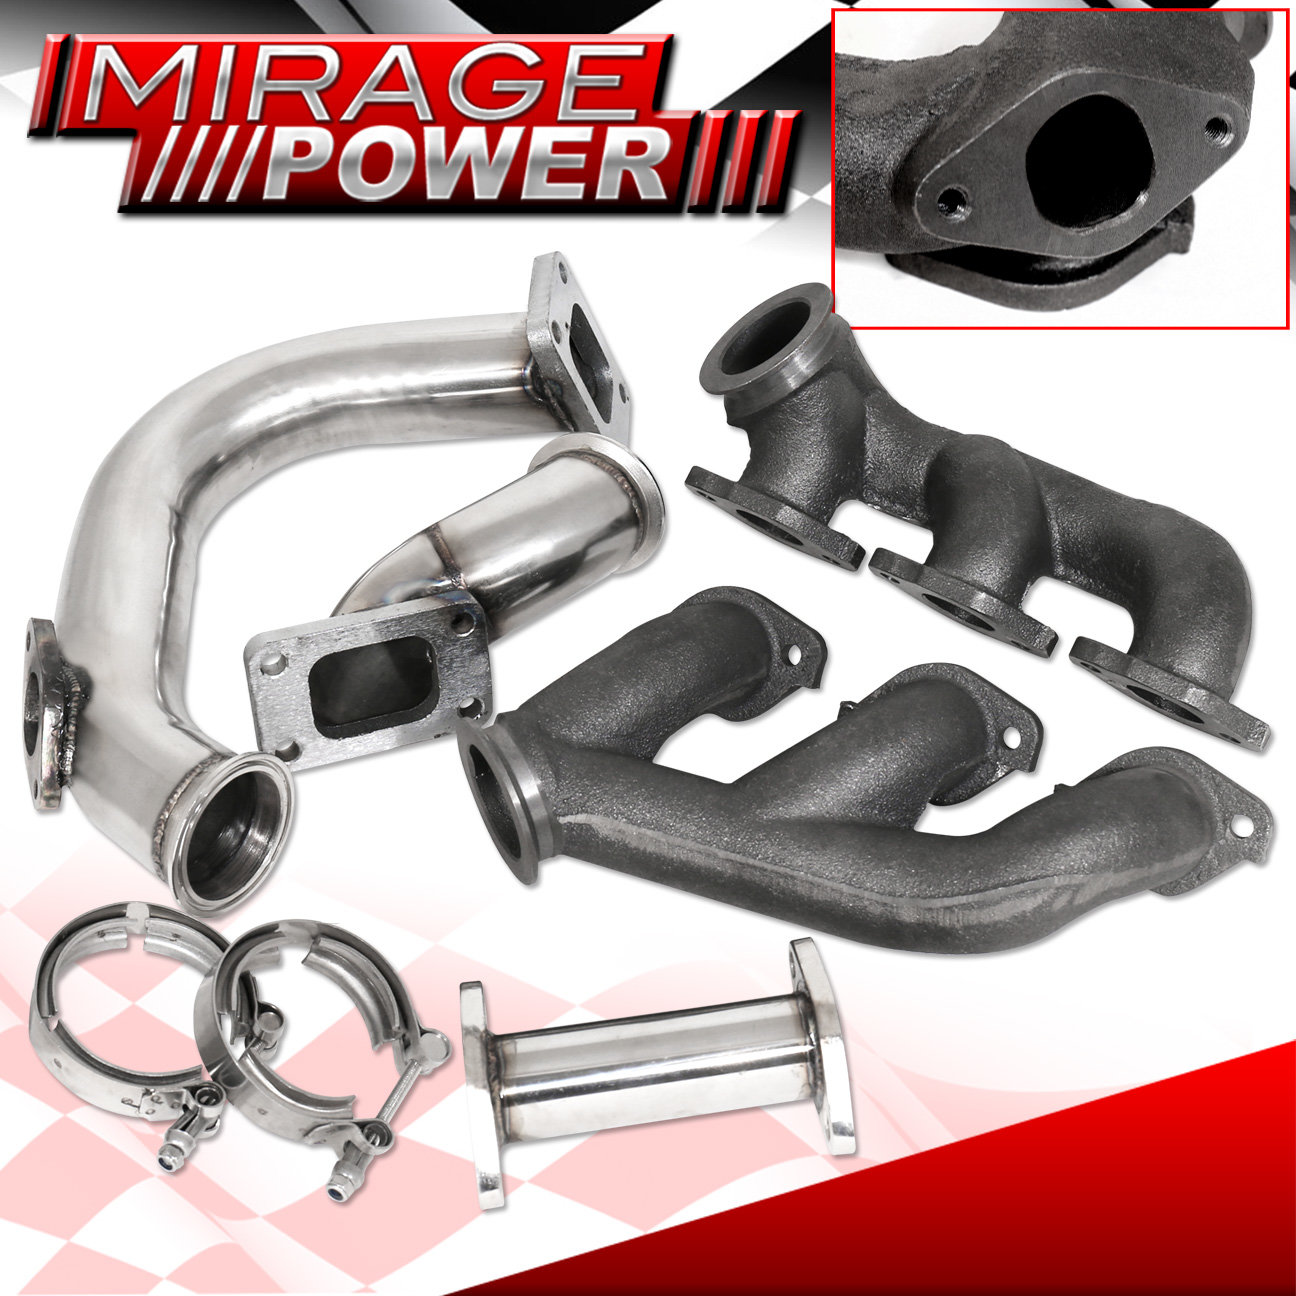 94-97 Mustang 3.8L Twin Turbo Cast Iron Manifold